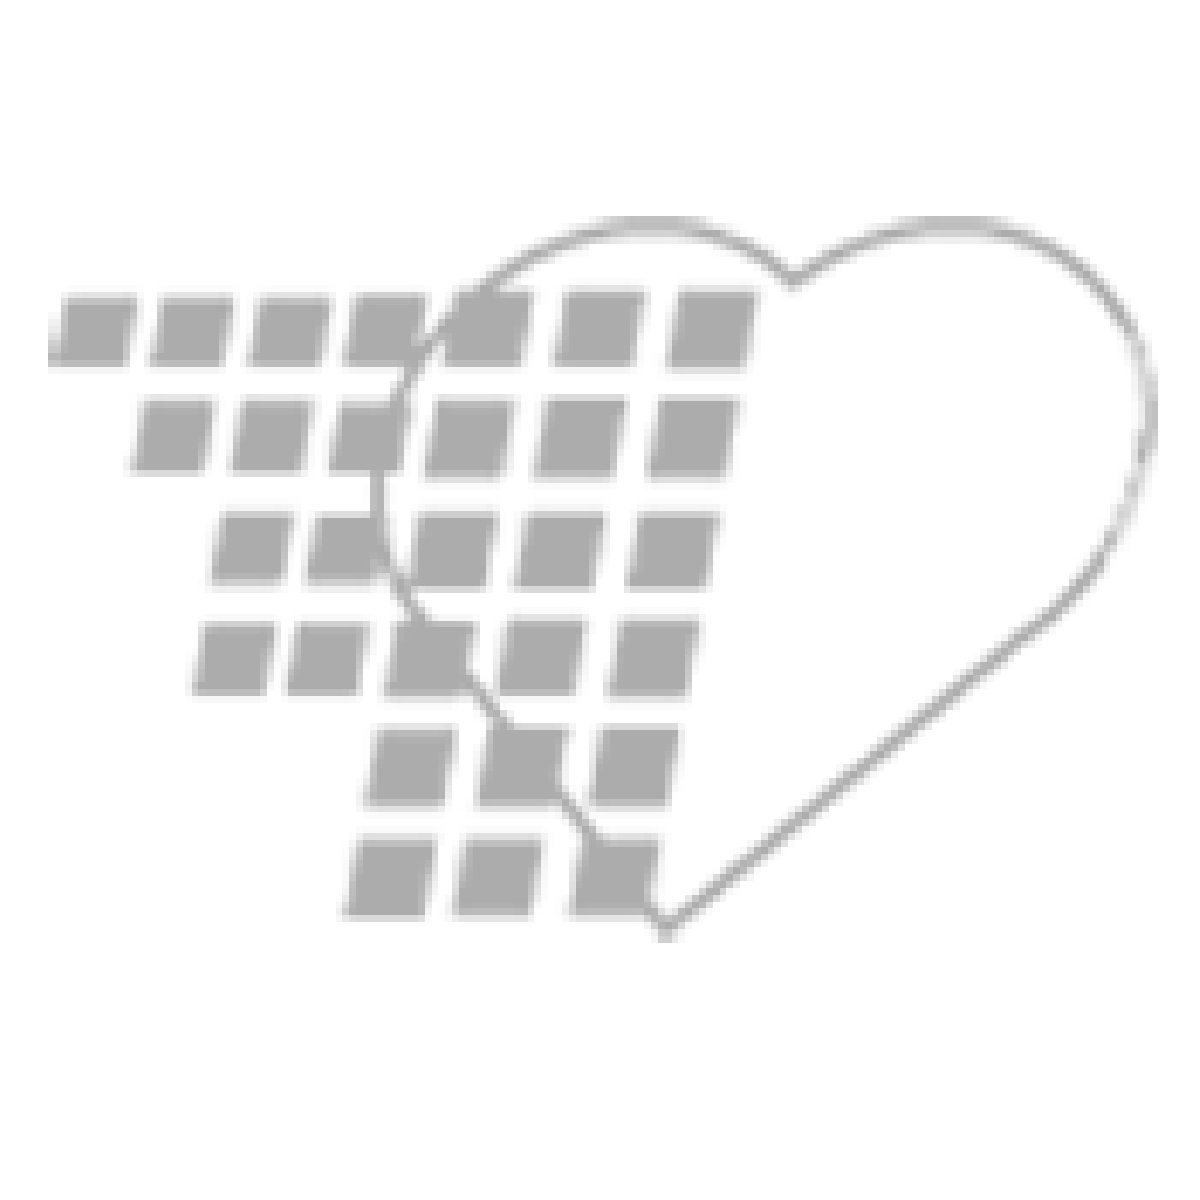 "06-26-3056 - JELCO® PROTECTIV® Safety I.V. Catheter - 20G x 1 1/4"""